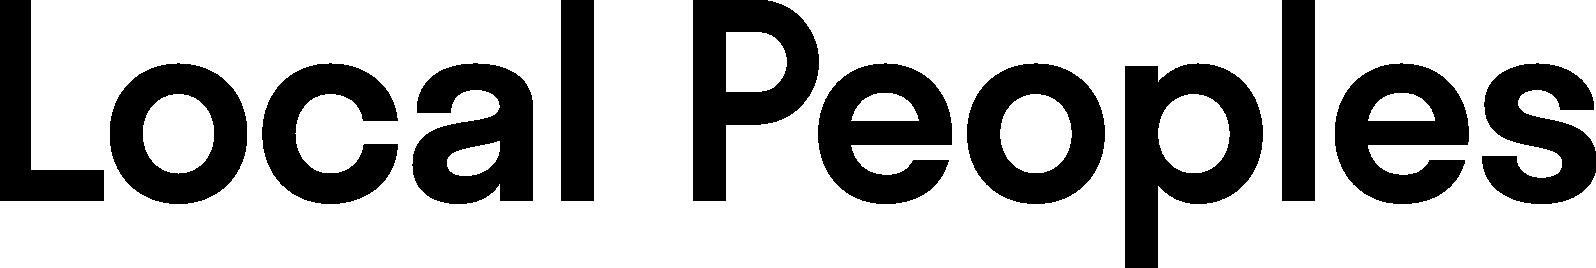 Local ppl 161007_LP Branding_Logotype-BLACK-CMYK_FA01_1